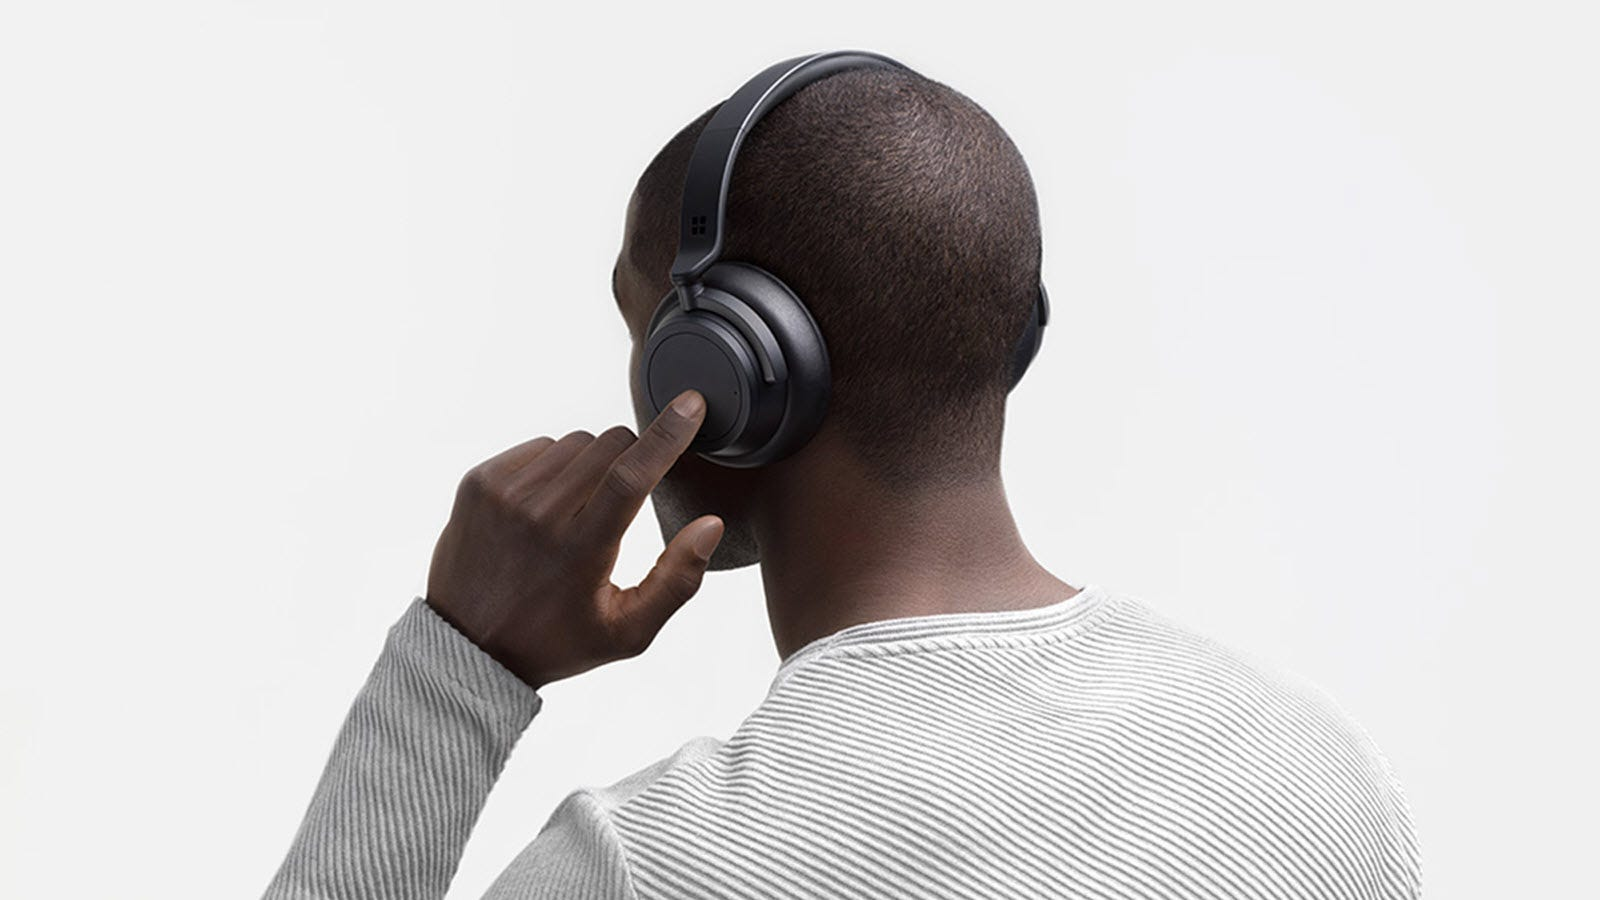 A man wearing a black pair of headphones.